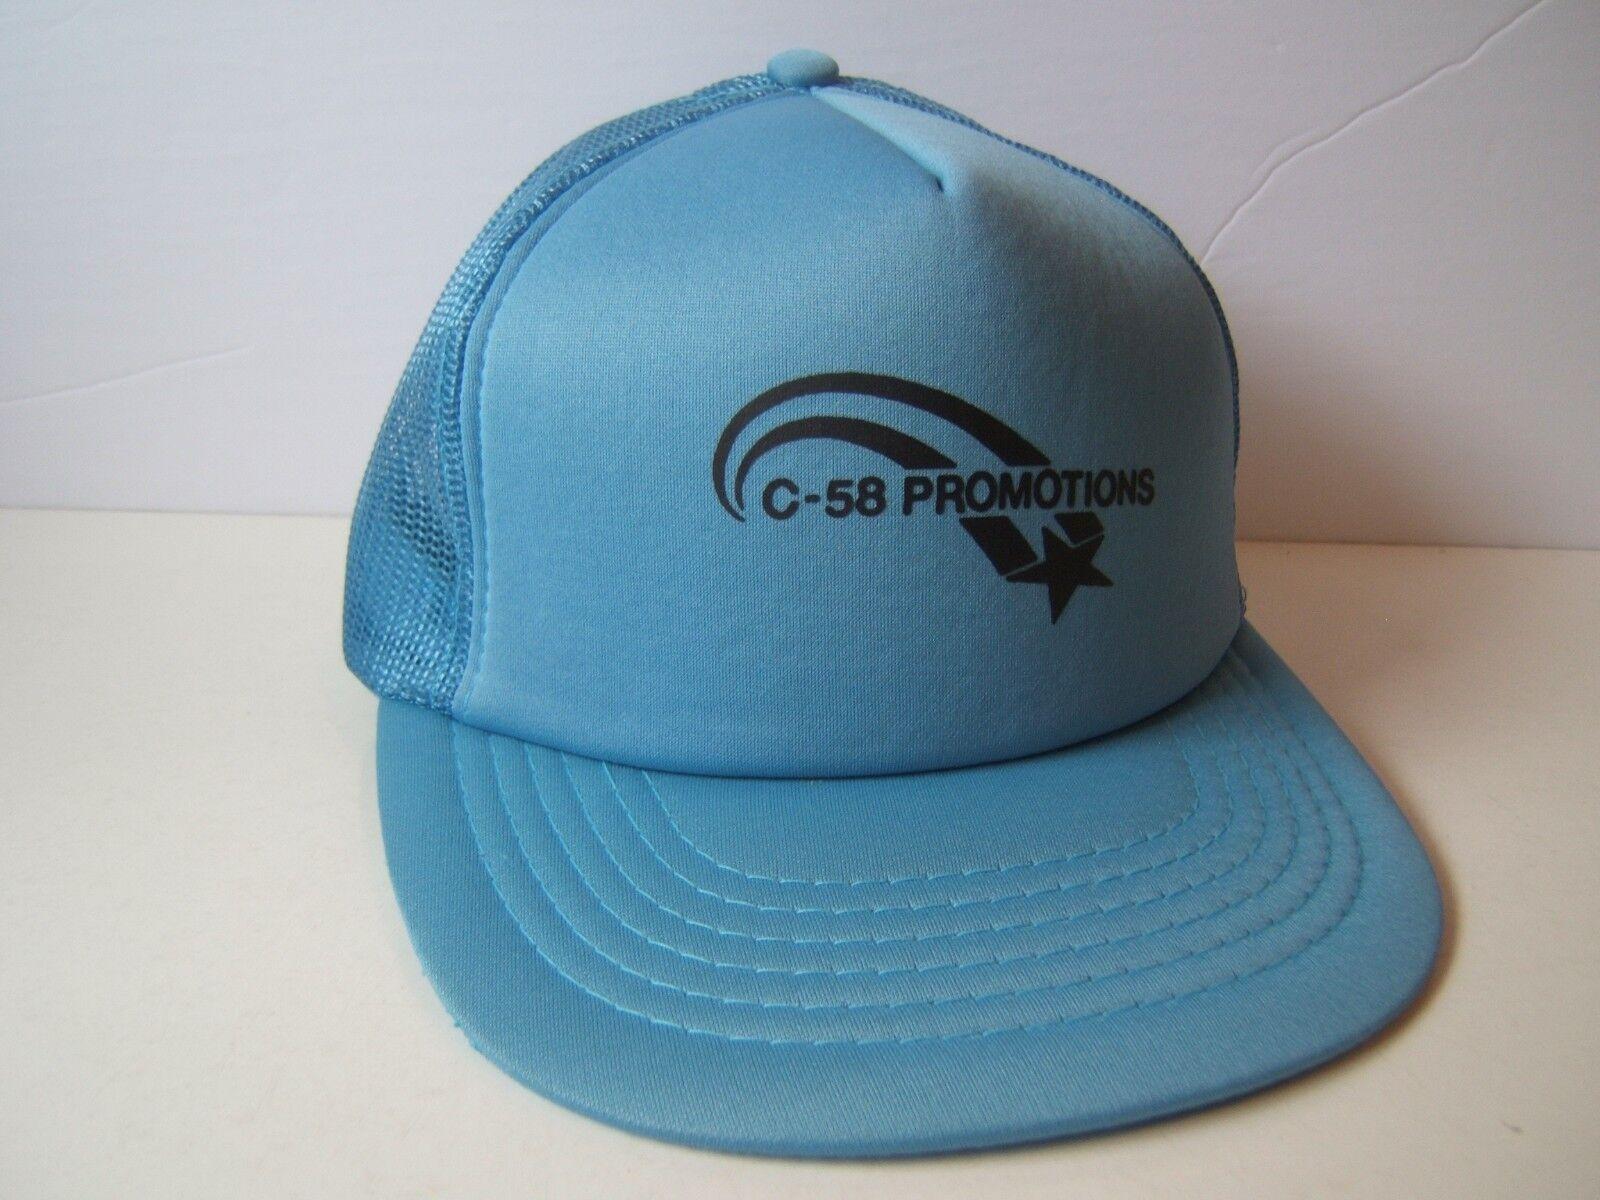 C-58 Promotions Hat Snapback Vintage Blue Snapback Hat Trucker Cap ff7221